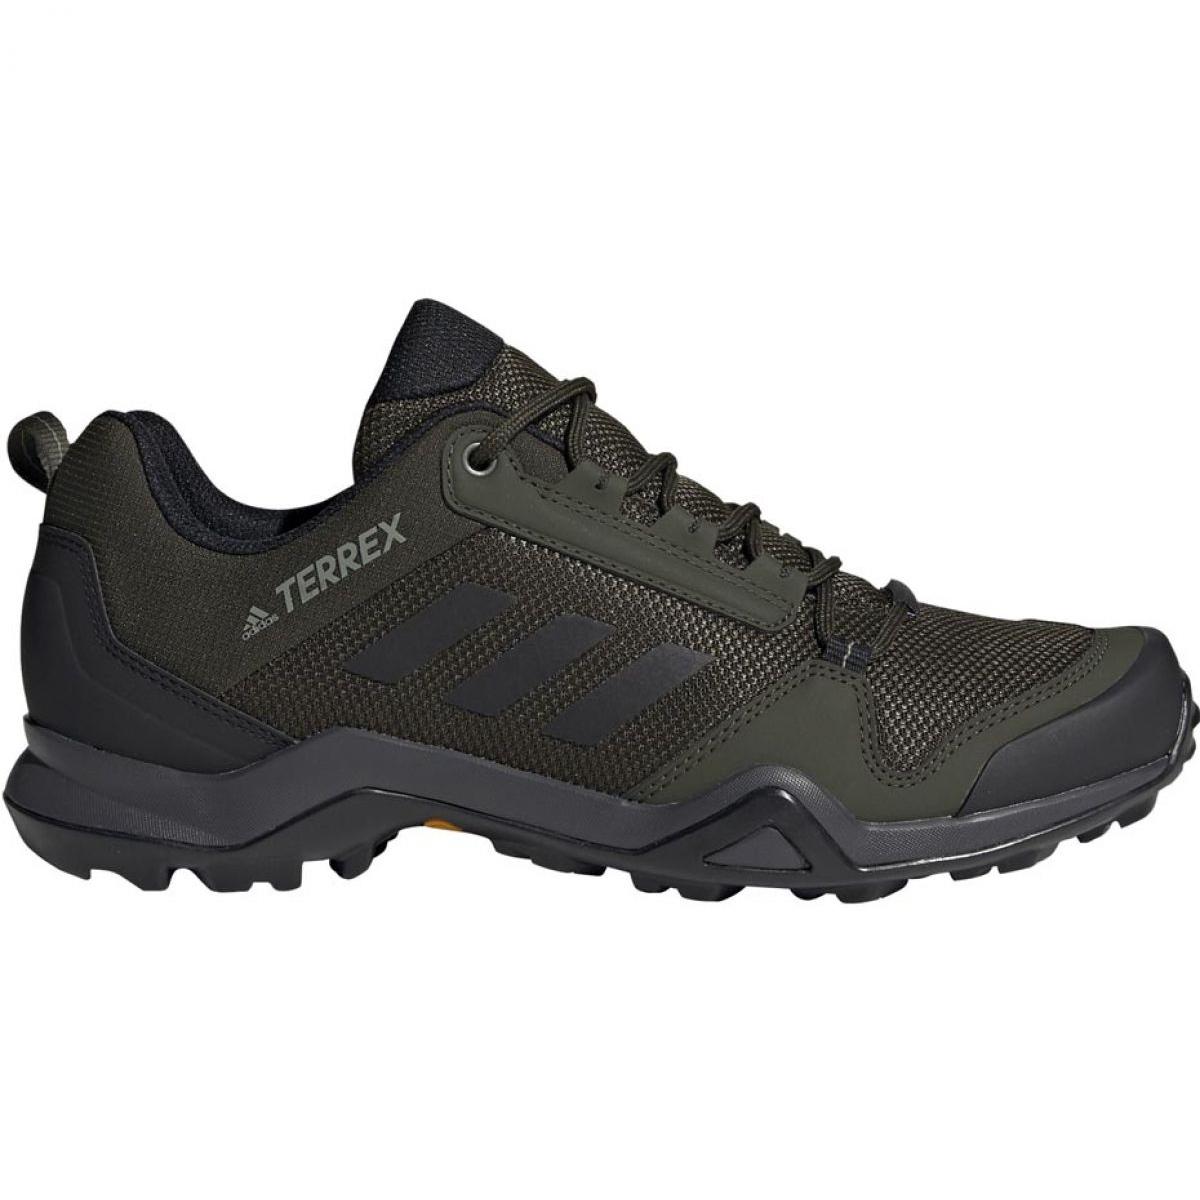 vert Pantoufles de trekking adidas Terrex AX3 M BC0526